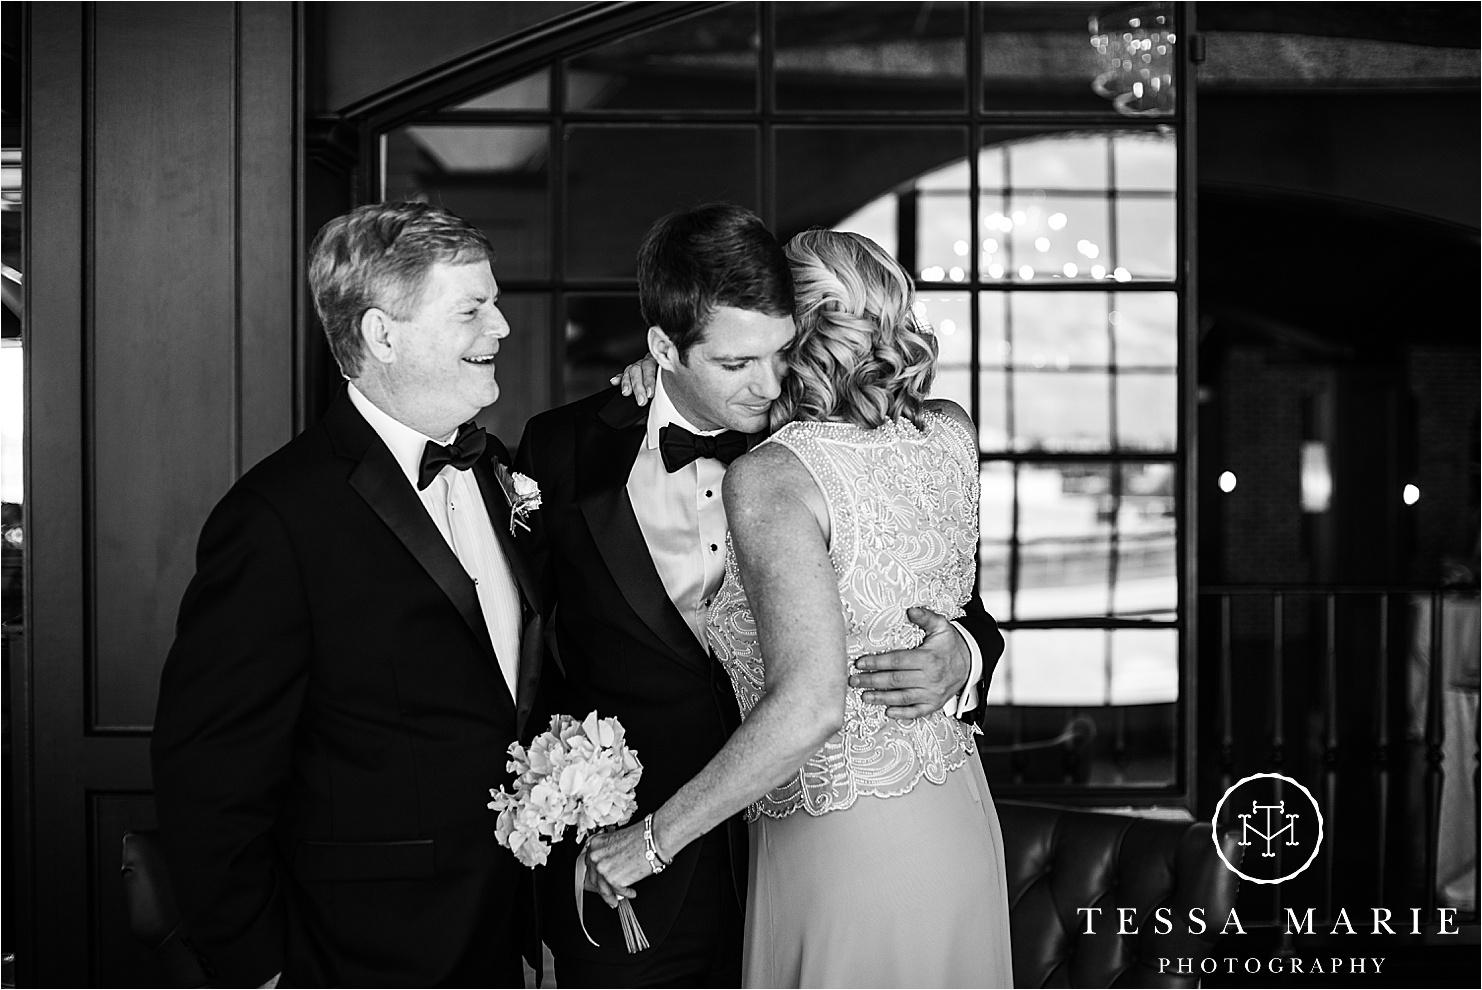 Tessa_marie_weddings_houston_wedding_photographer_The_astorian_0092.jpg